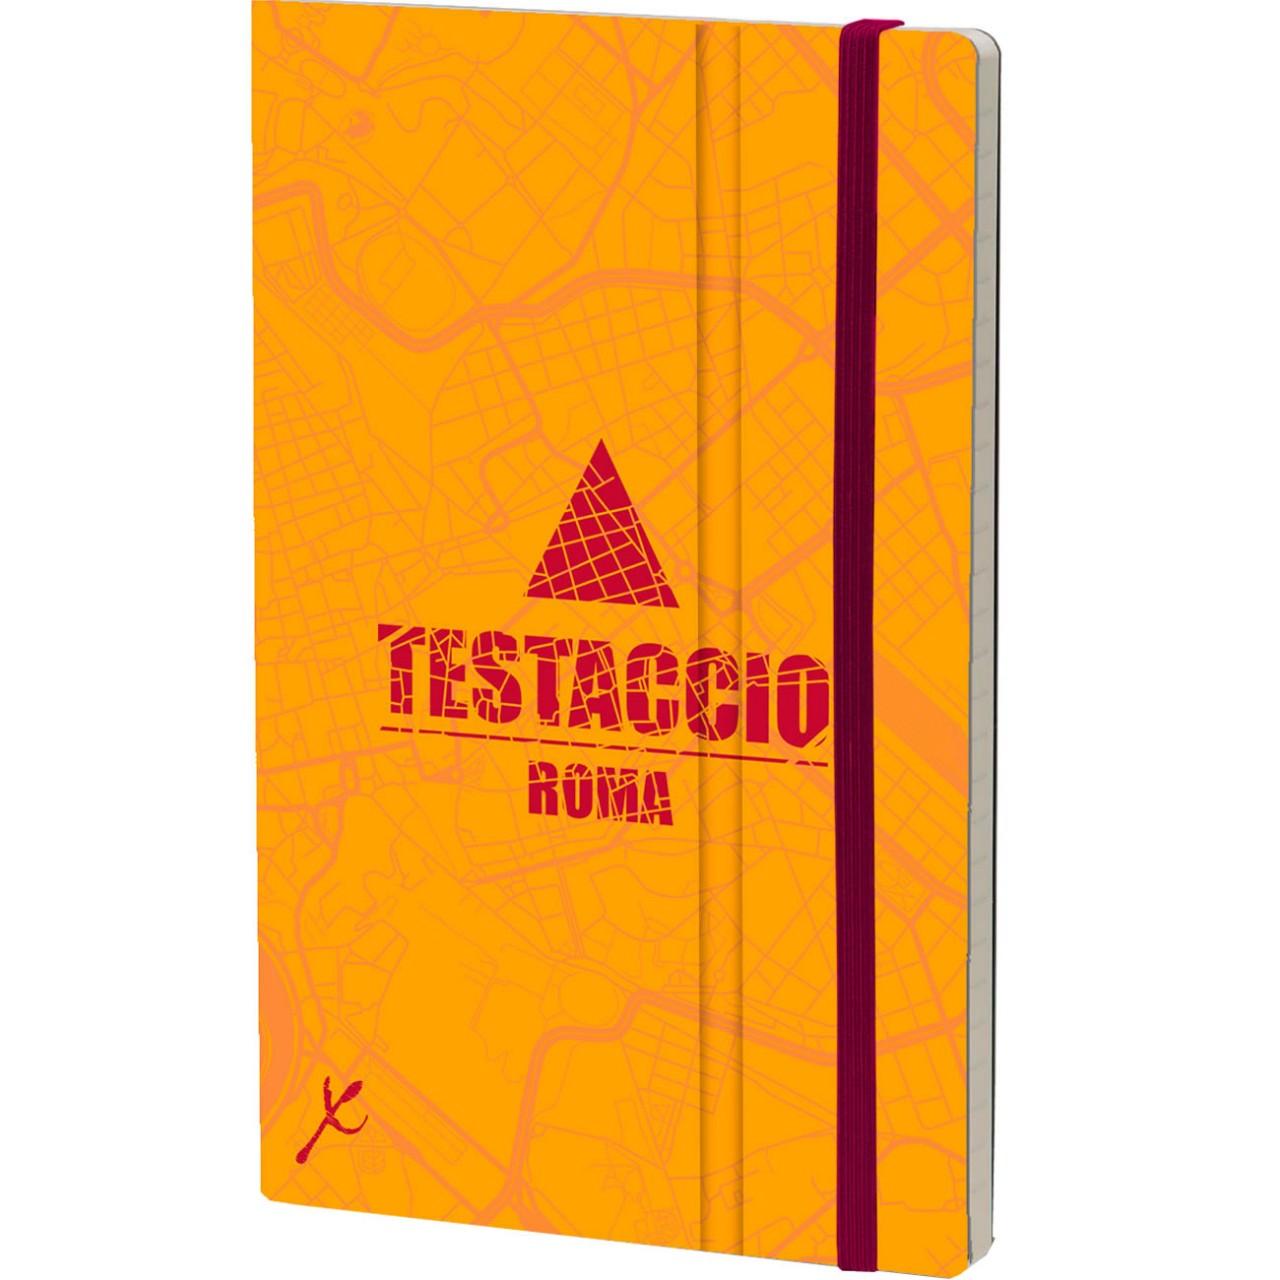 Stifflexible Notizbuch URBANHOOD 13 x 21 cm 192 S., ROMA - TESTACCIO